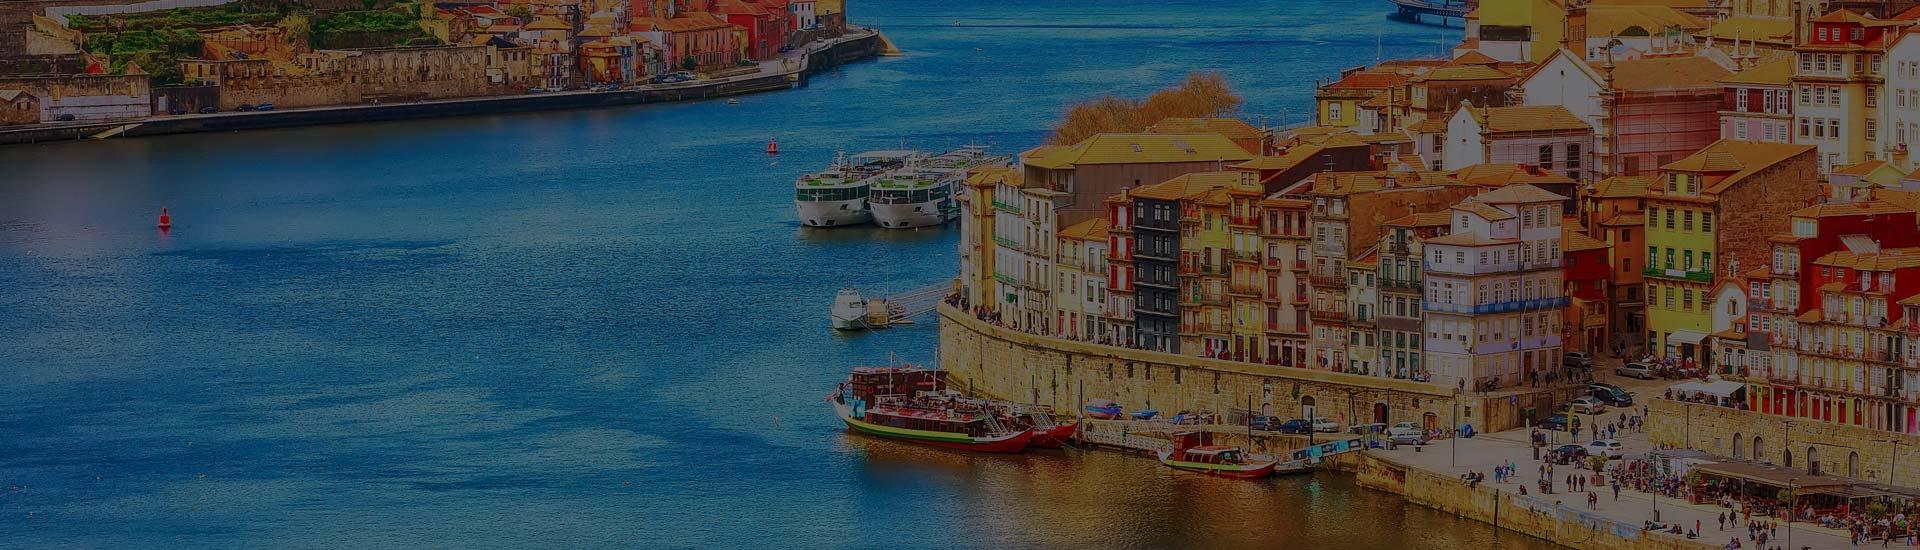 Spedition-Portugal-Logistikunternehmen